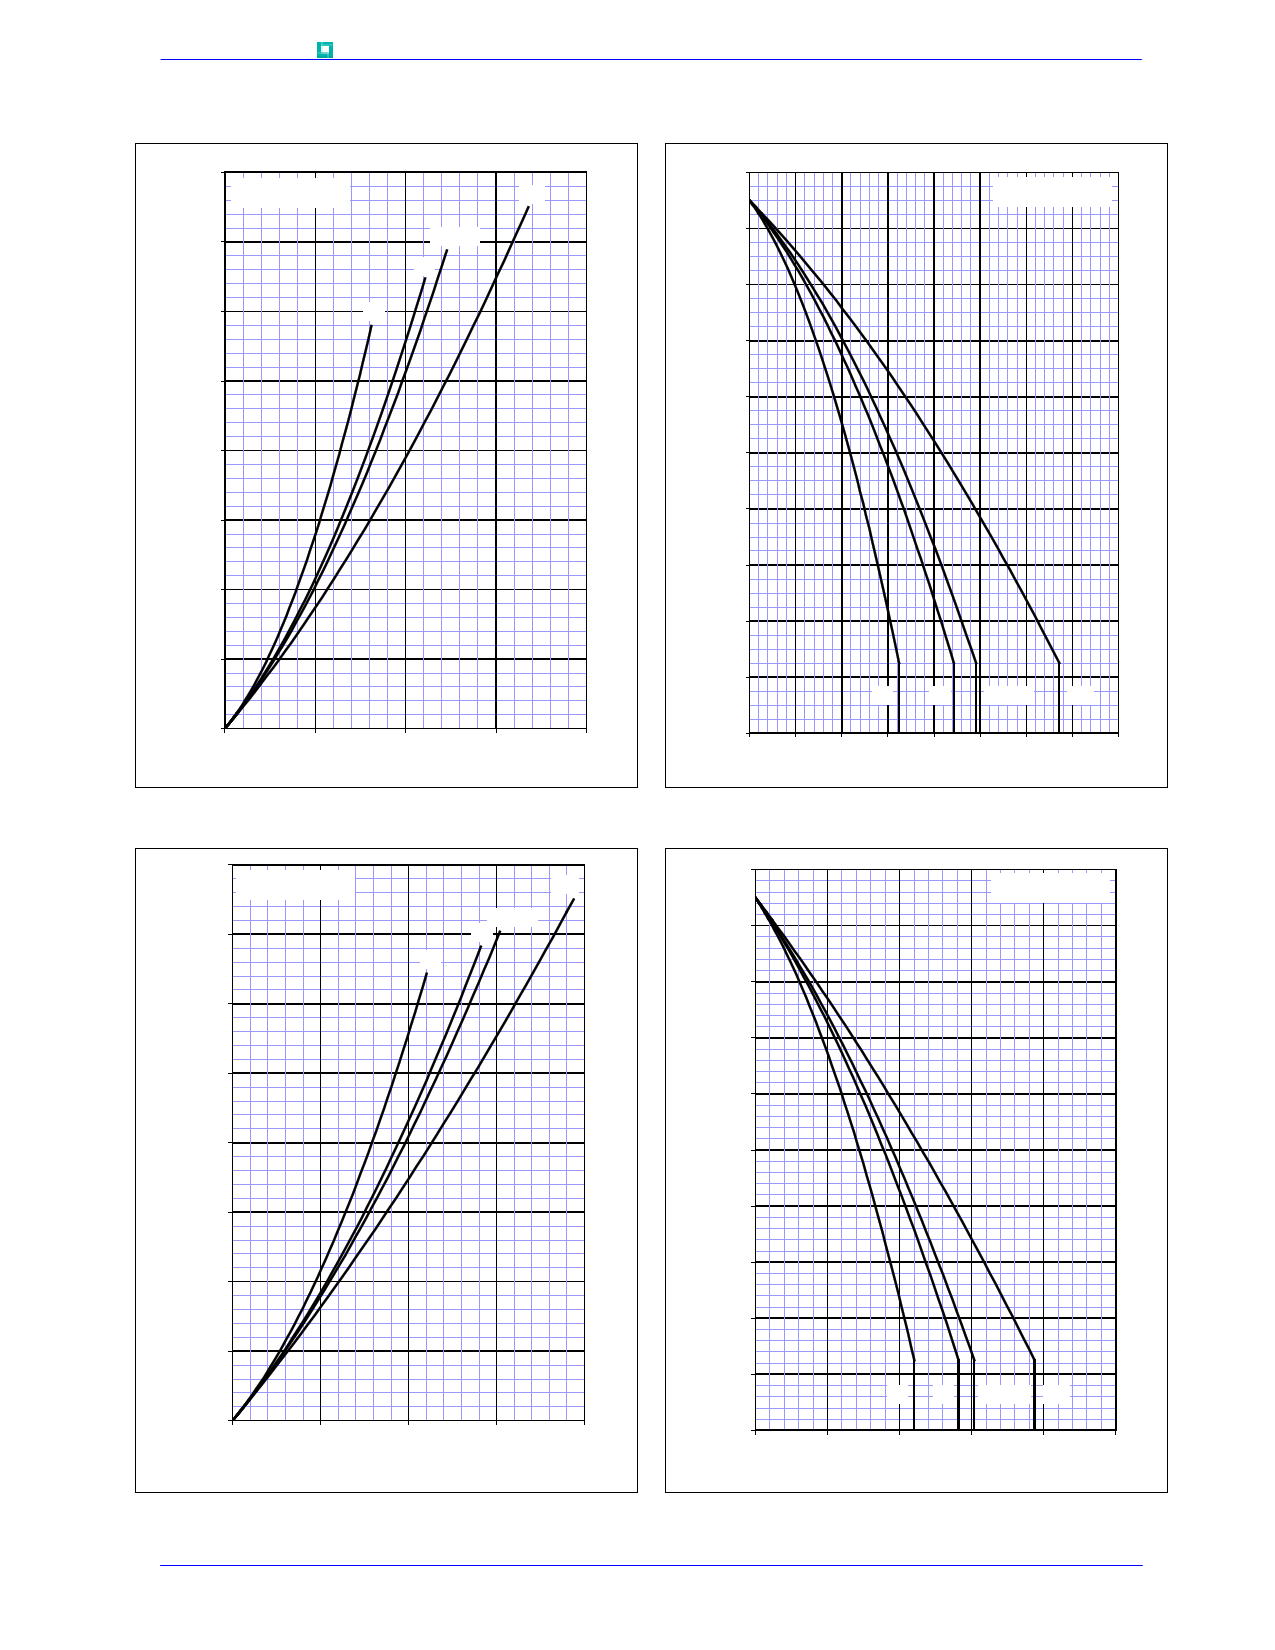 W4534NC060 pdf, 数据表